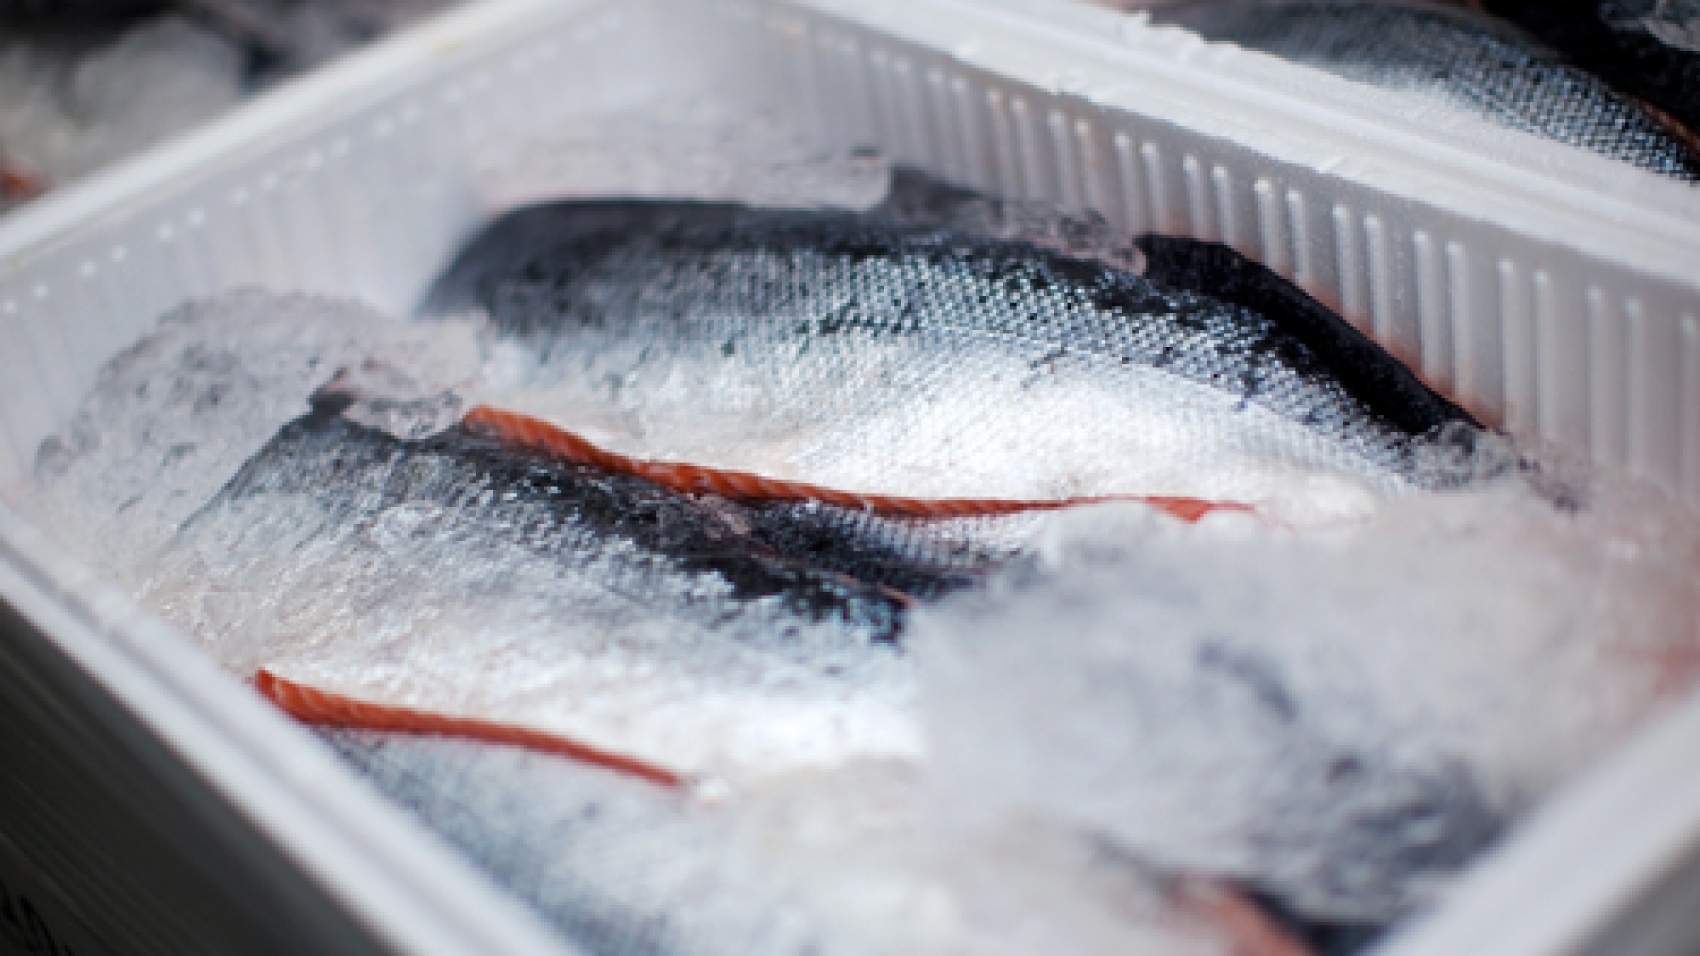 whole-salmons-lying-iced-transportation-box